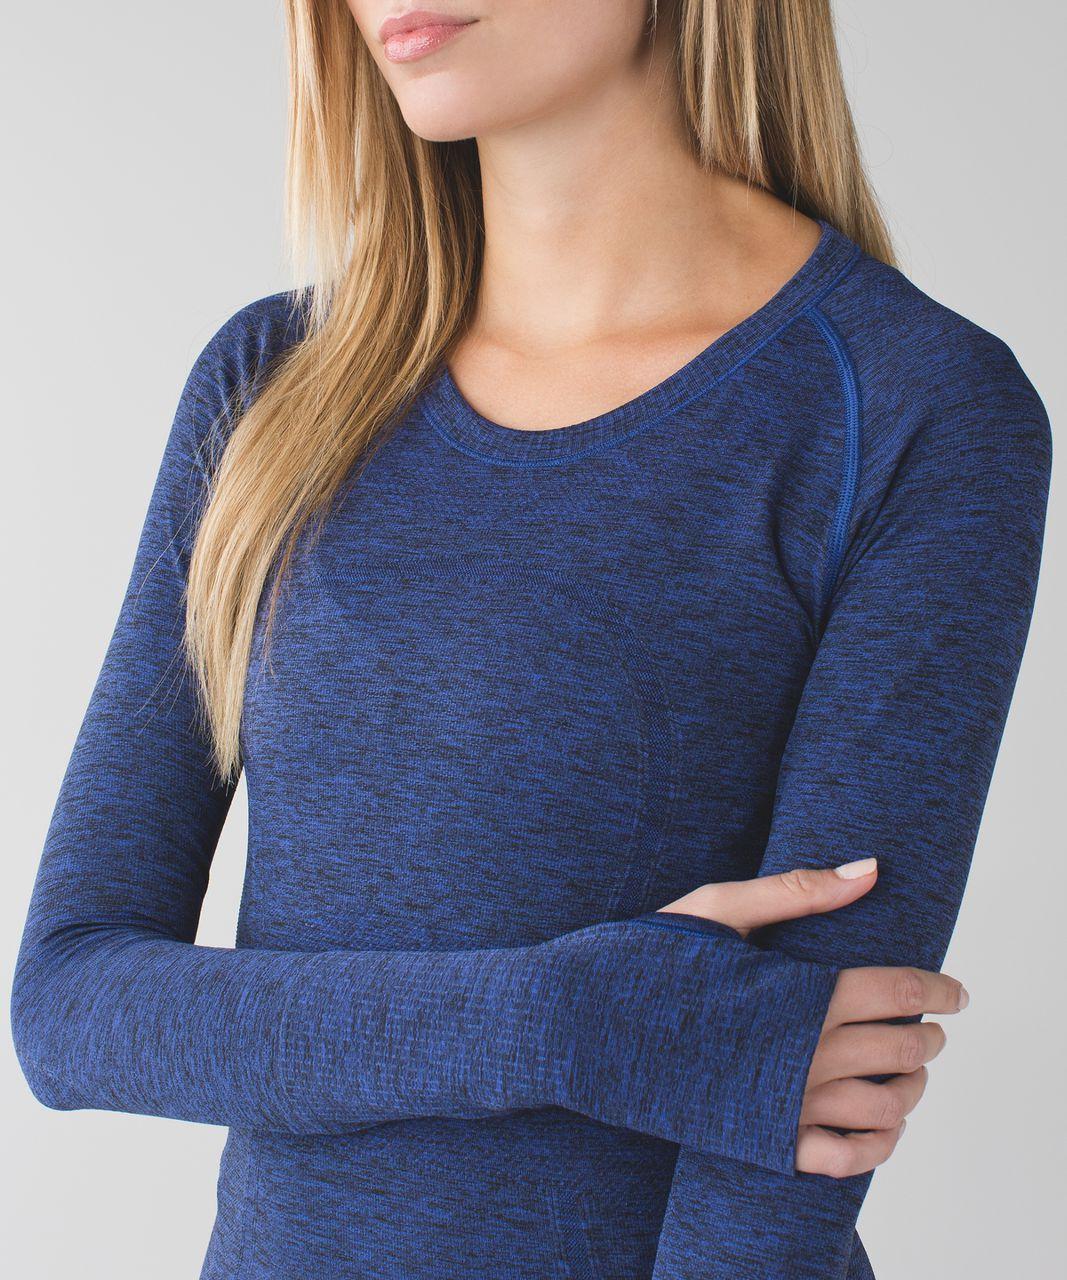 Lululemon Swiftly Tech Long Sleeve Crew - Heathered Sapphire Blue